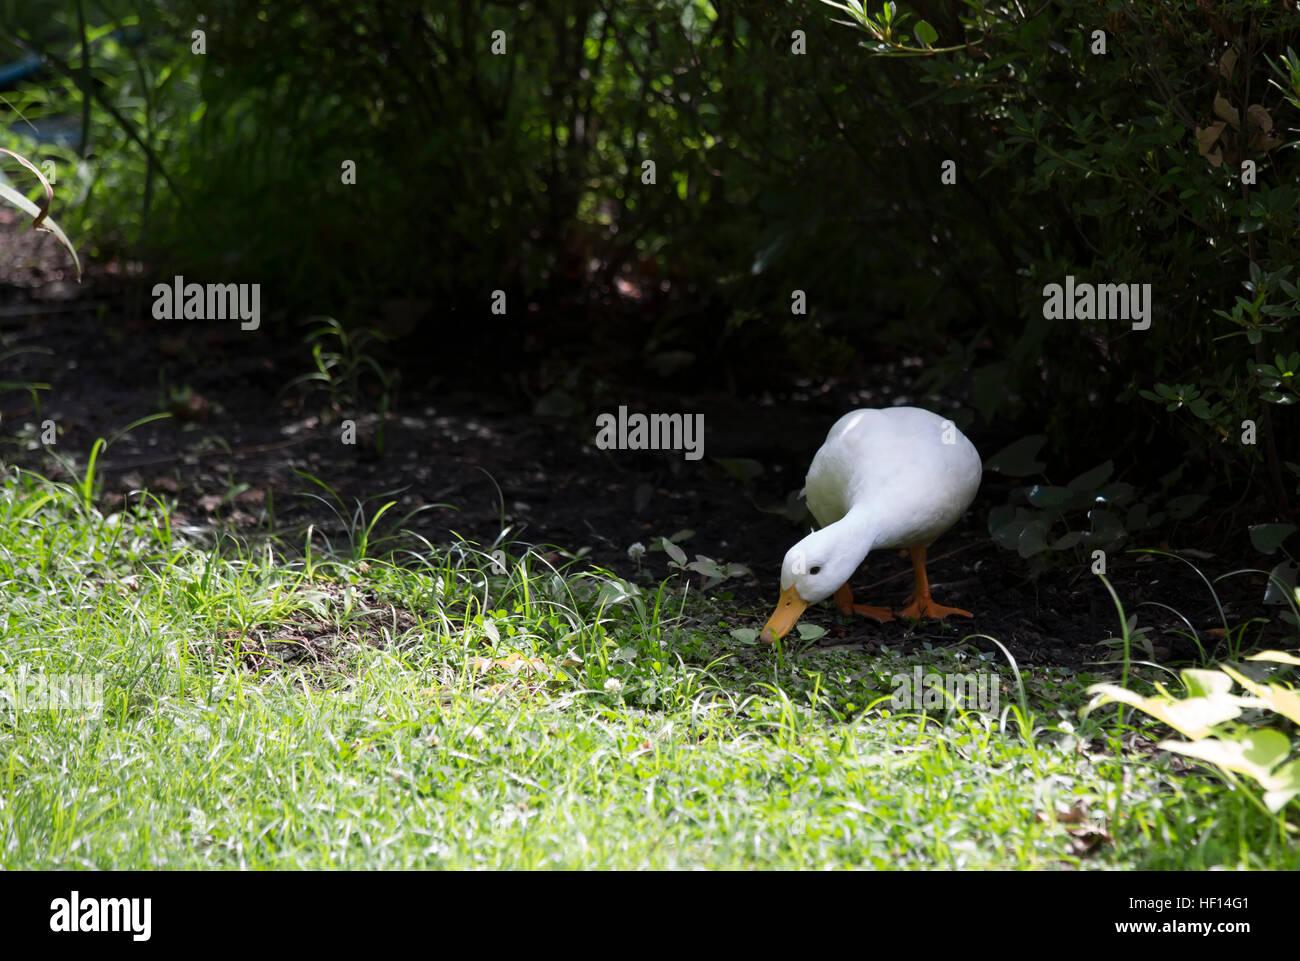 American Pekin duck in summer foliage - Stock Image